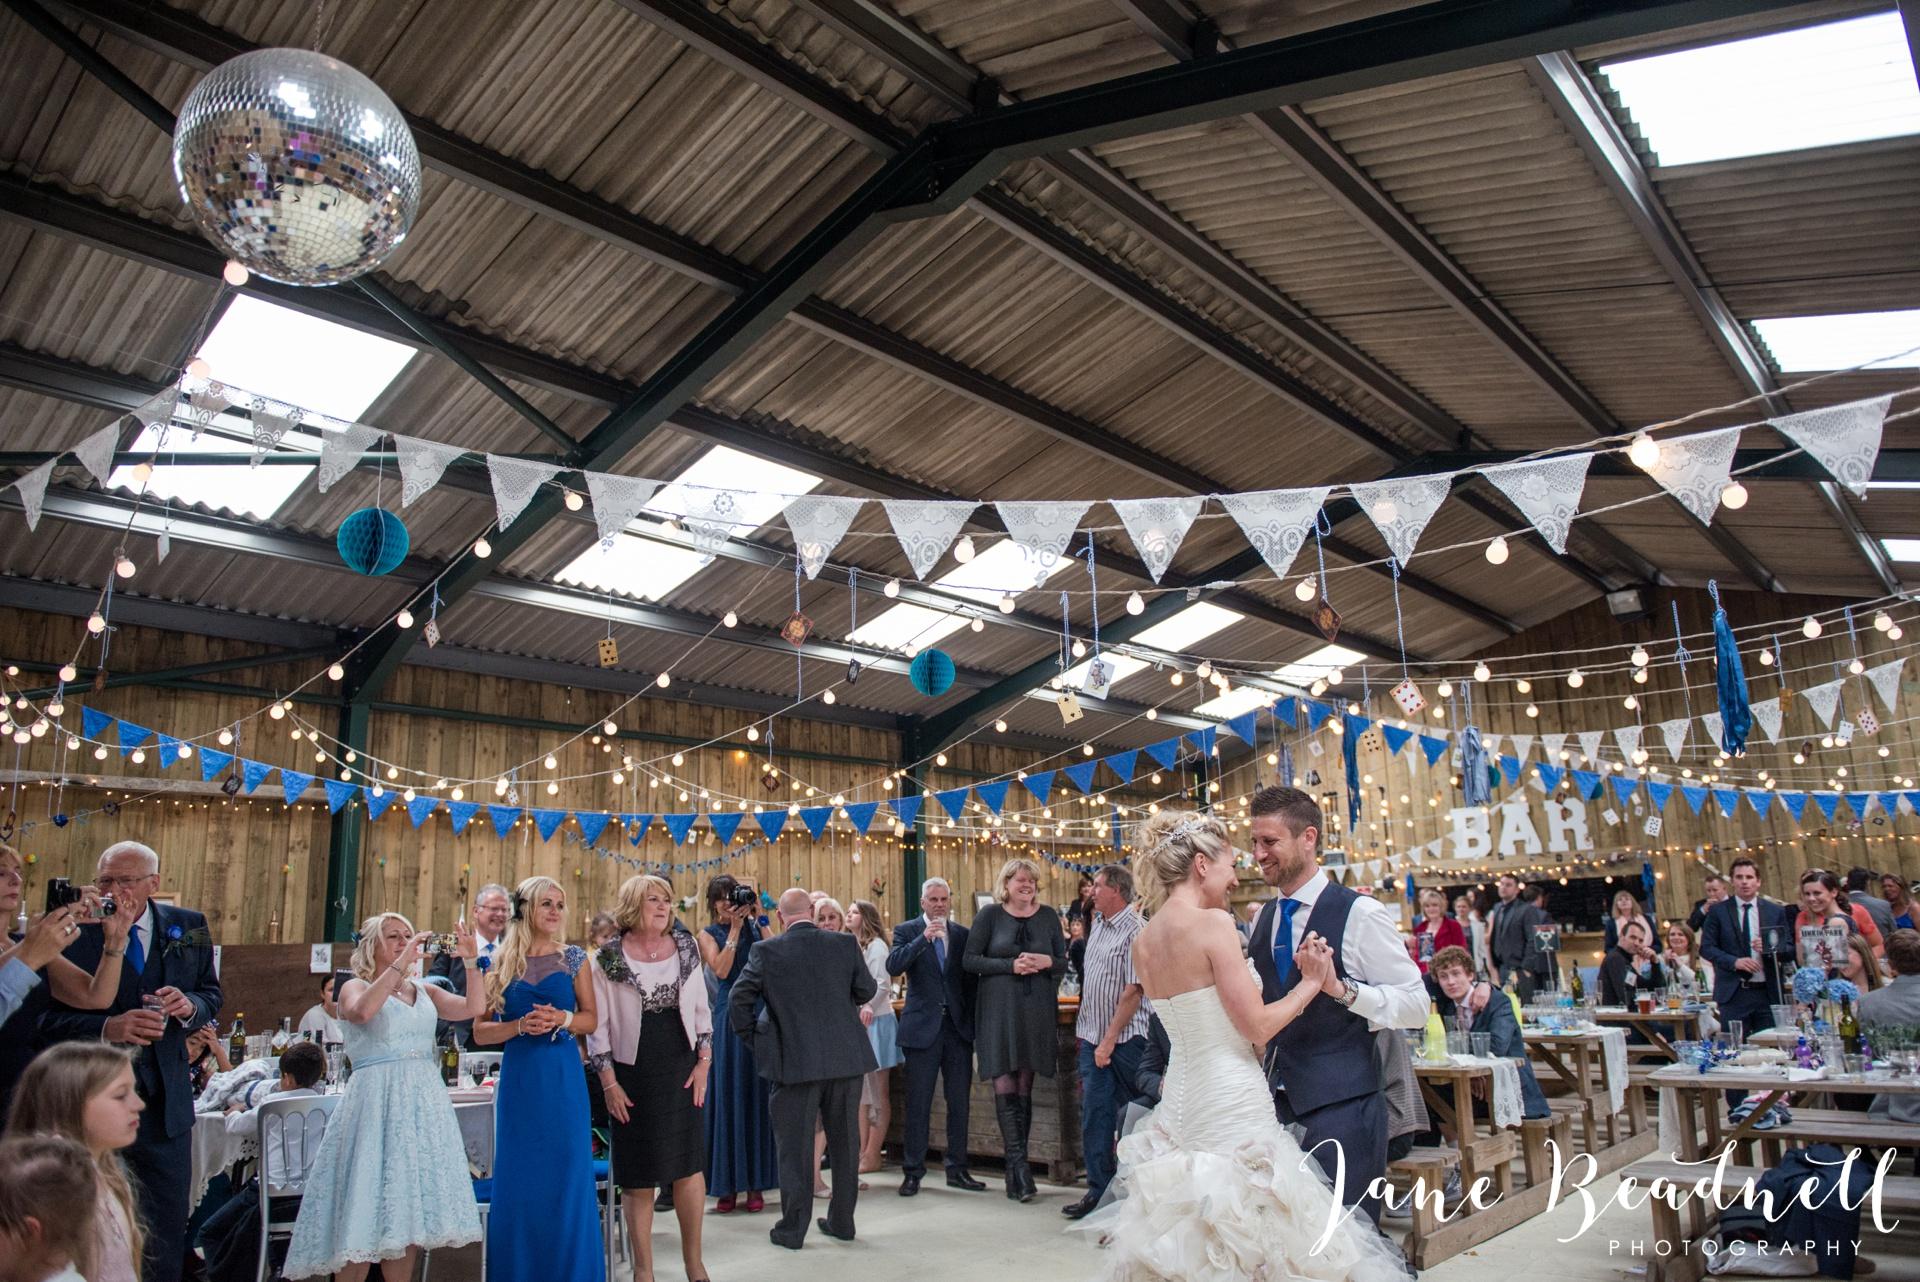 Hill Top Farm Wedding Photography Masham by Jane Beadnell Photography_0112